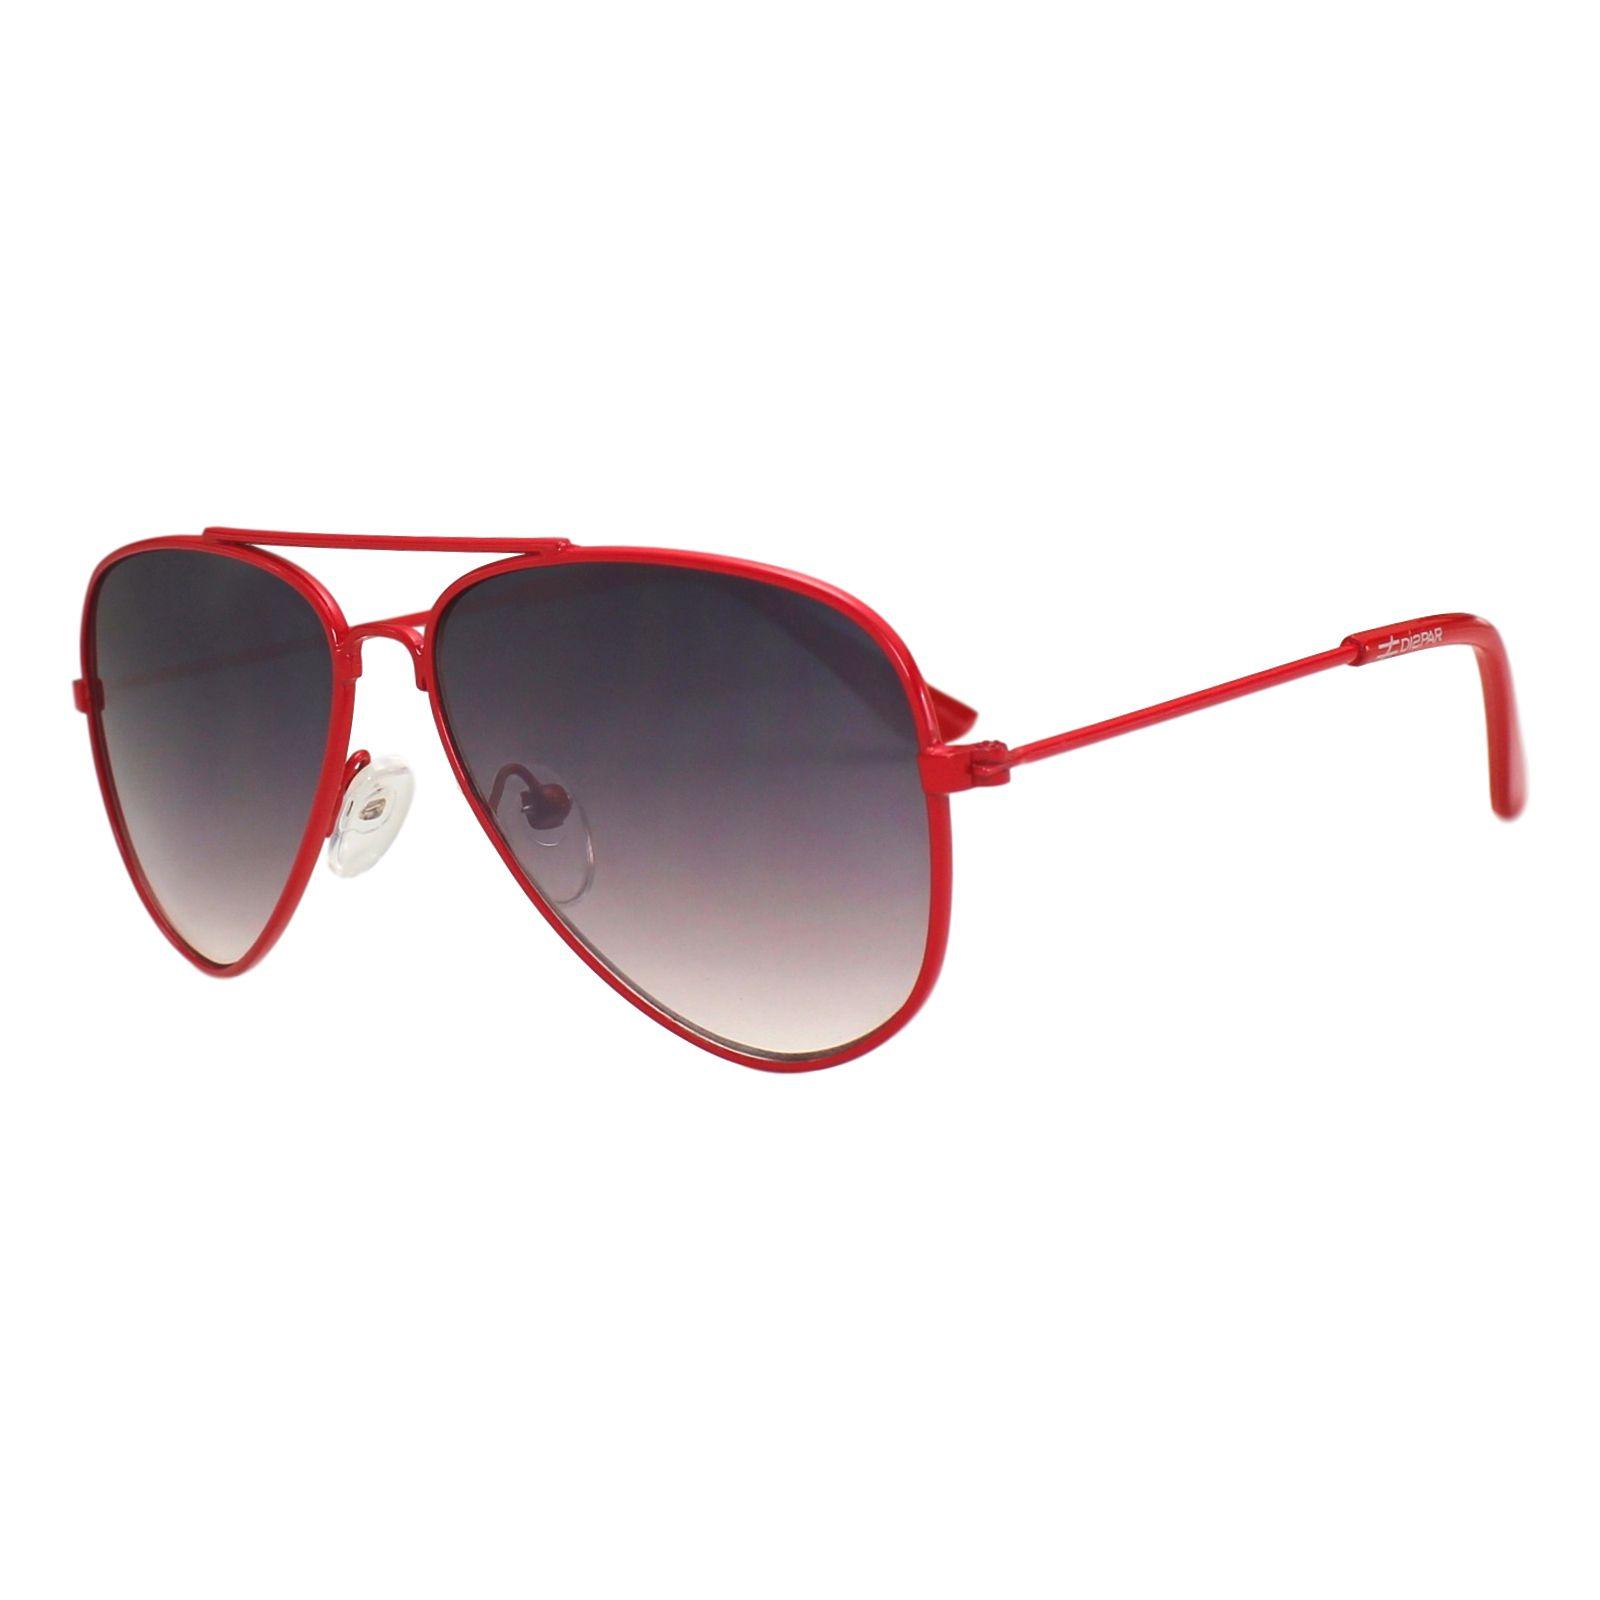 Óculos de Sol Díspar ID1797 infantil - Vermelho - Díspar Style ... 95bfec2646